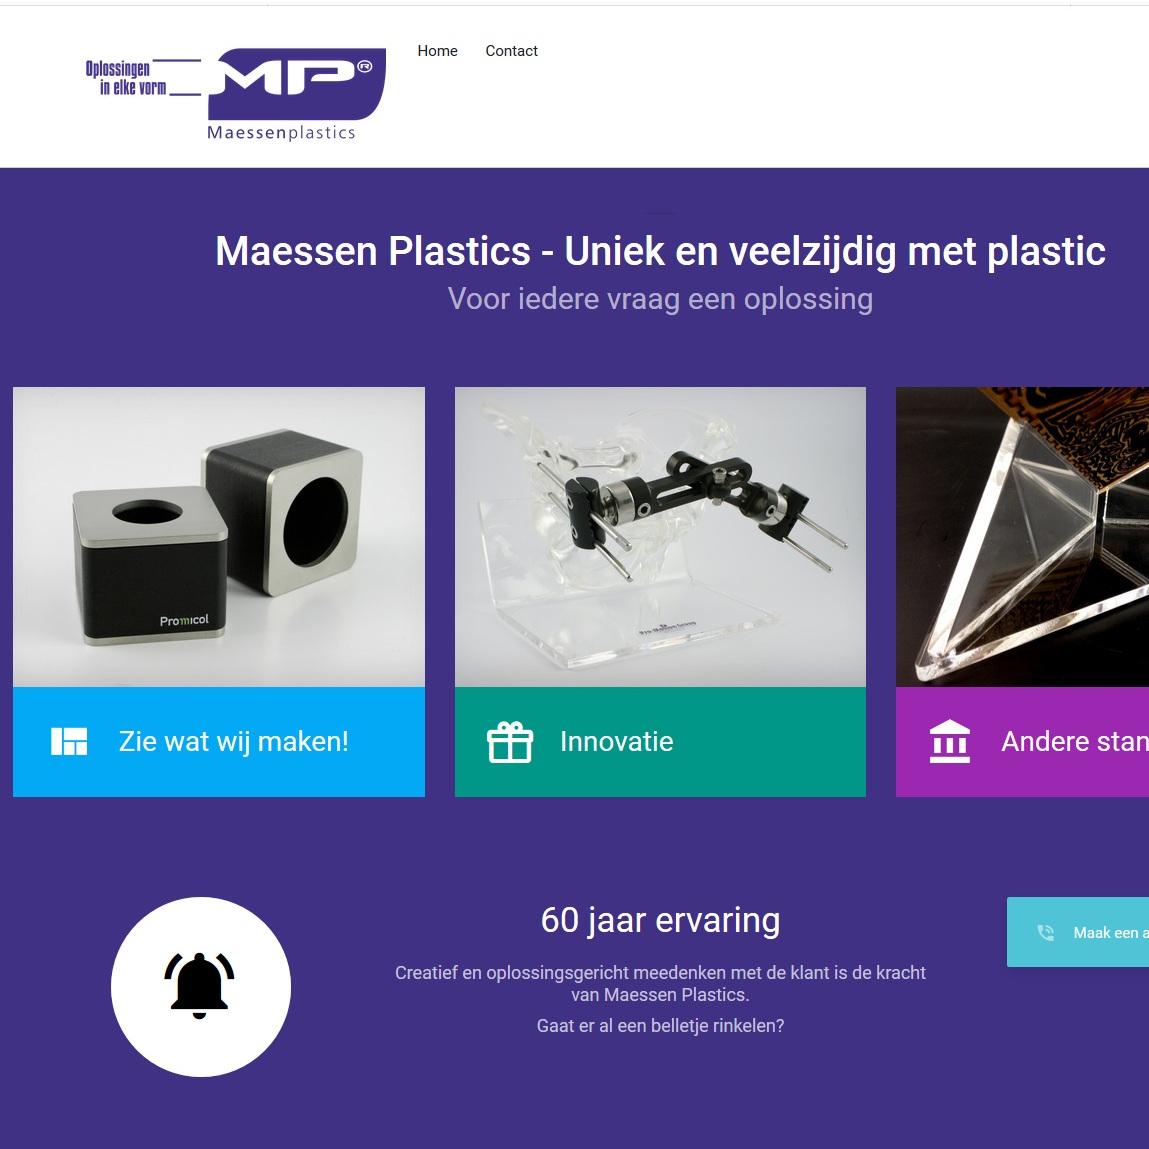 Maessen Plastics Maastricht